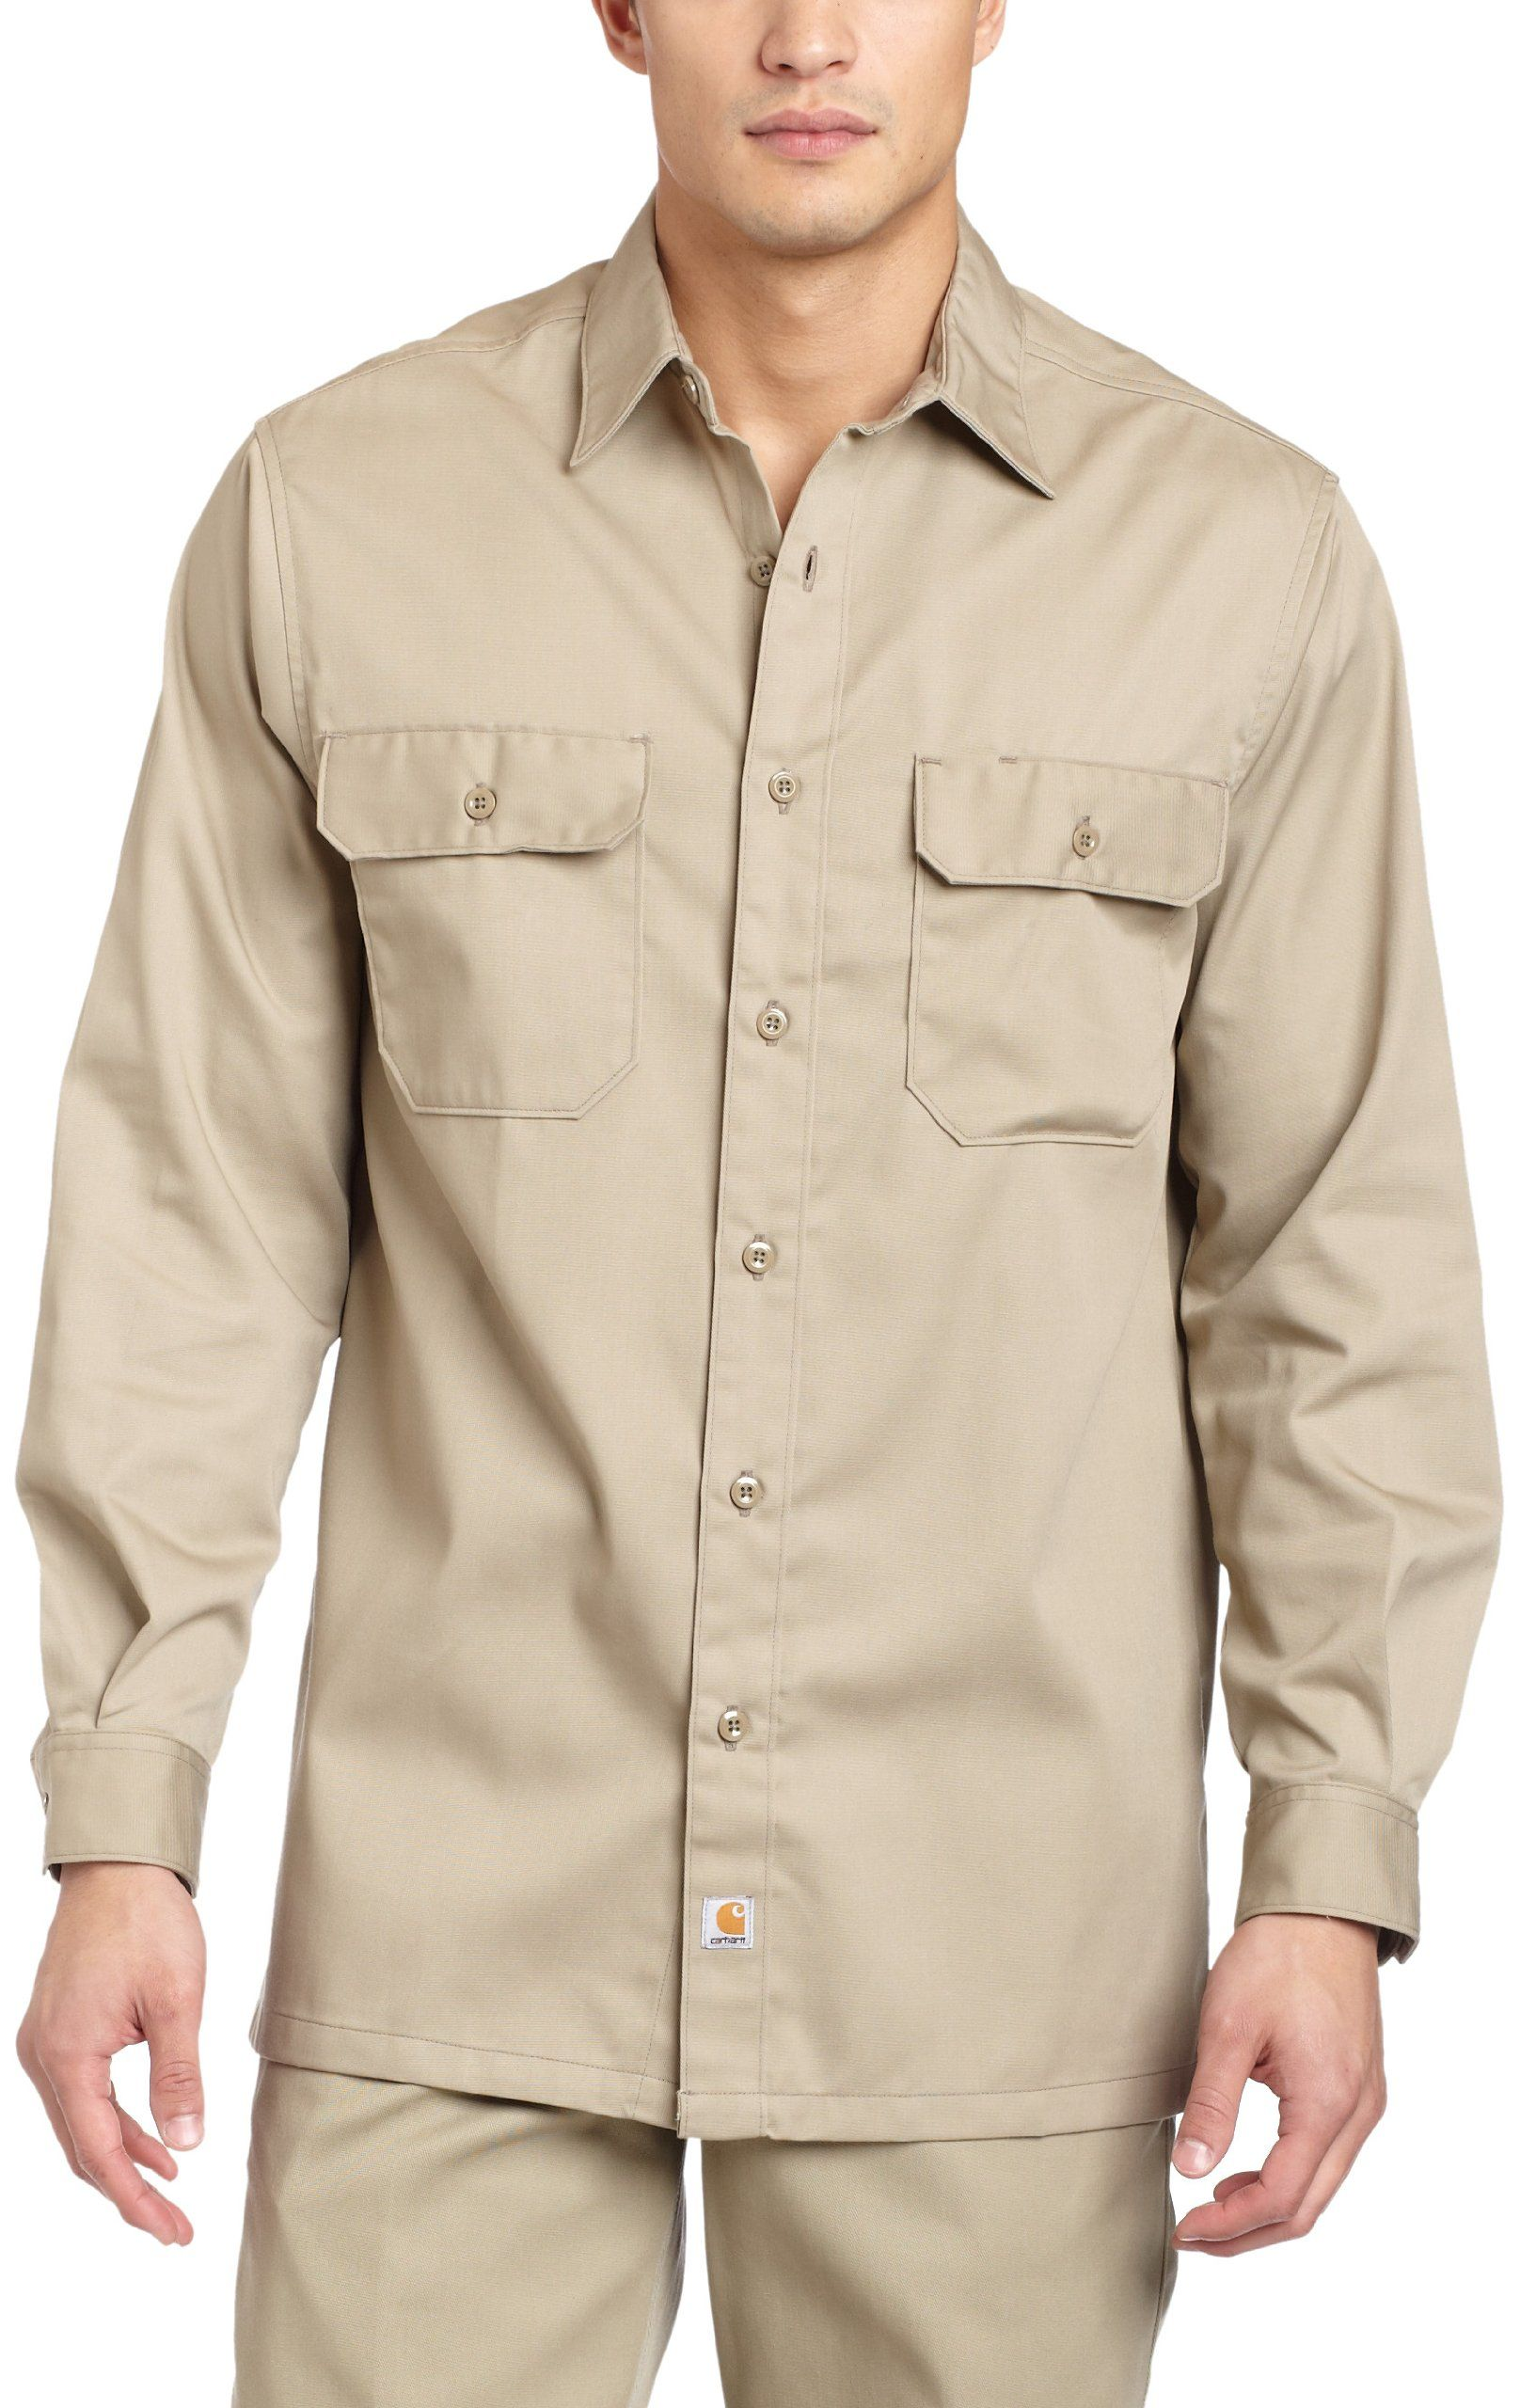 Mens Long Sleeve Shirt Button Up Down Canyon Creek Camping Fishing Outdoor NEW